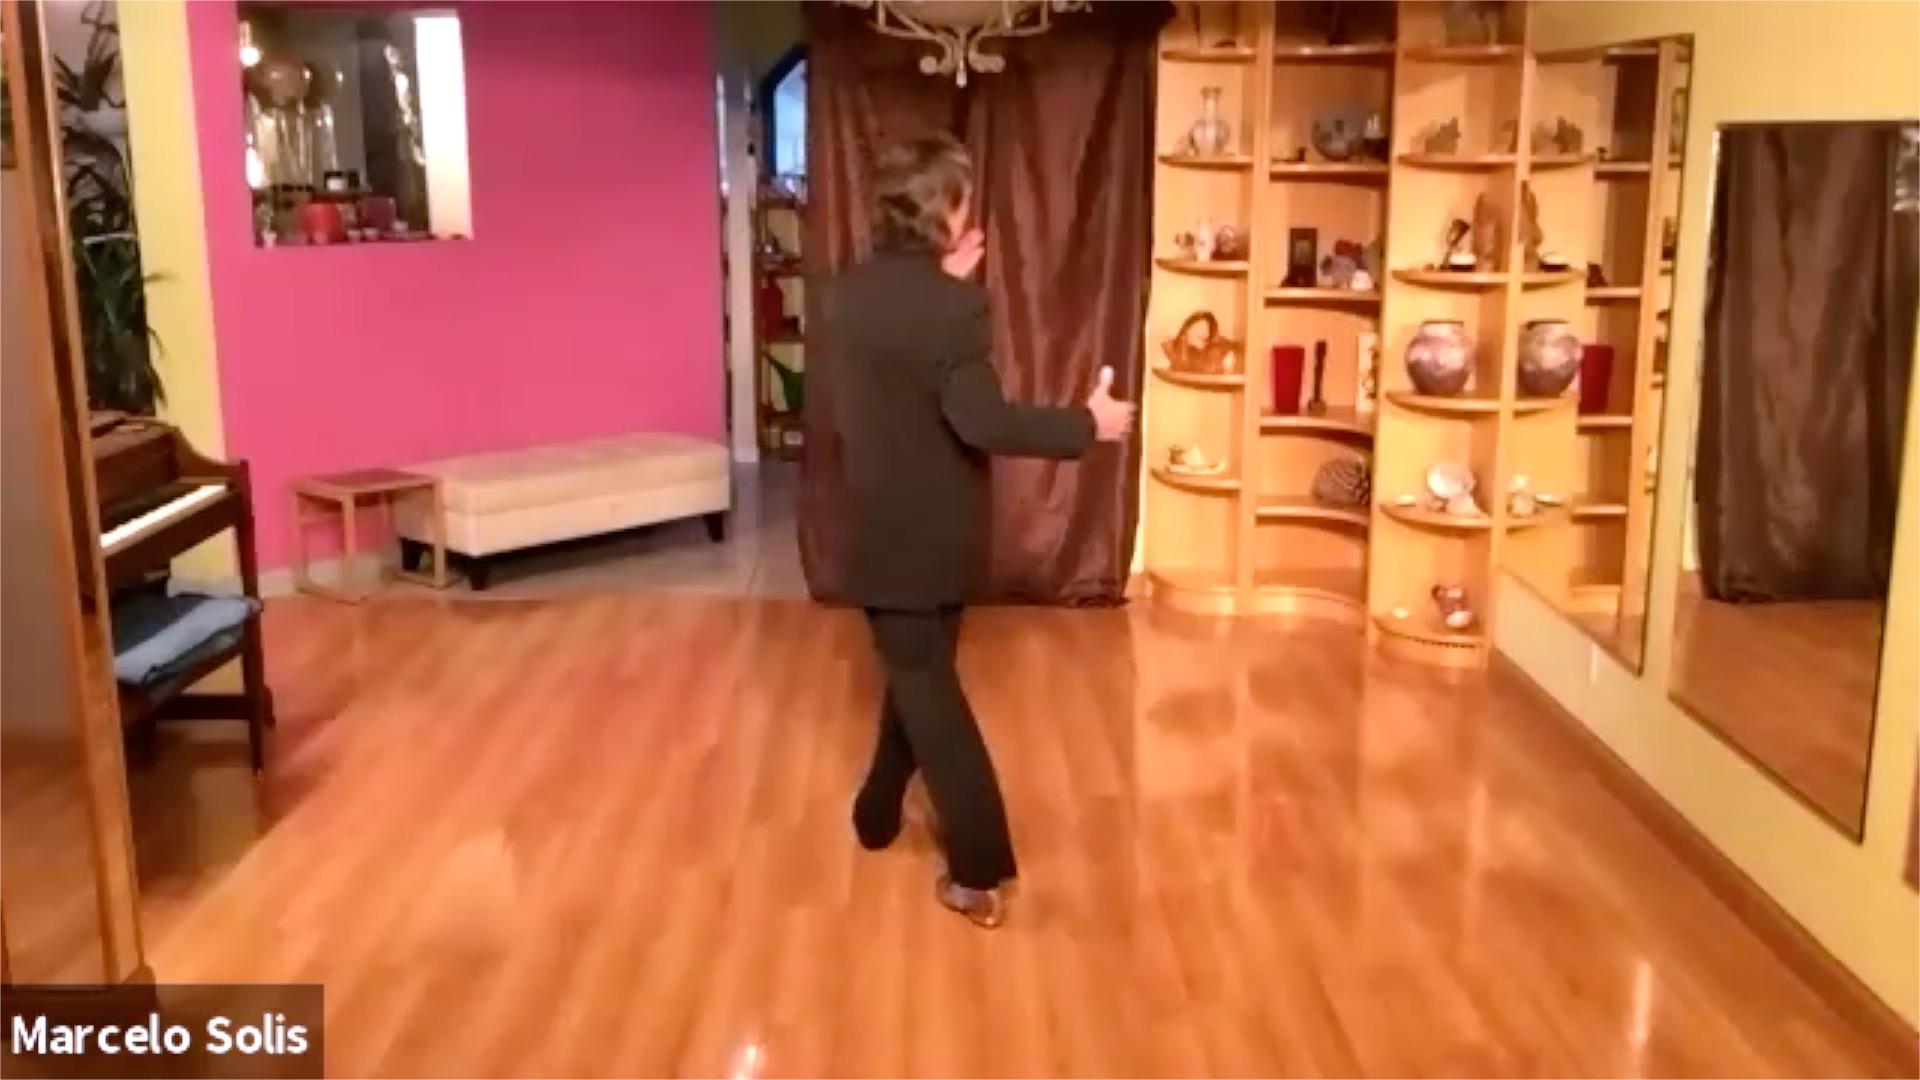 Argentine Tango class: forward-backward move sequence